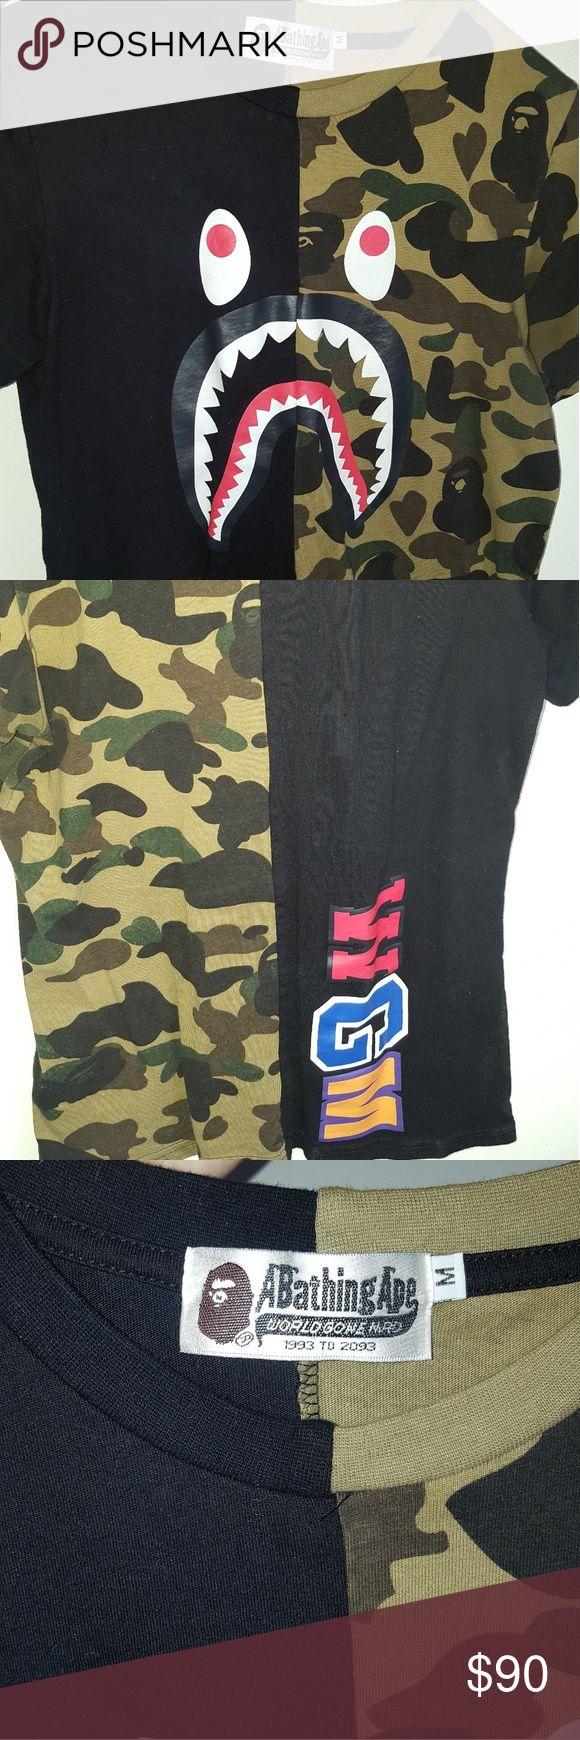 Bape Shirt Comes with Bag bape Shirts Tees - Short Sleeve